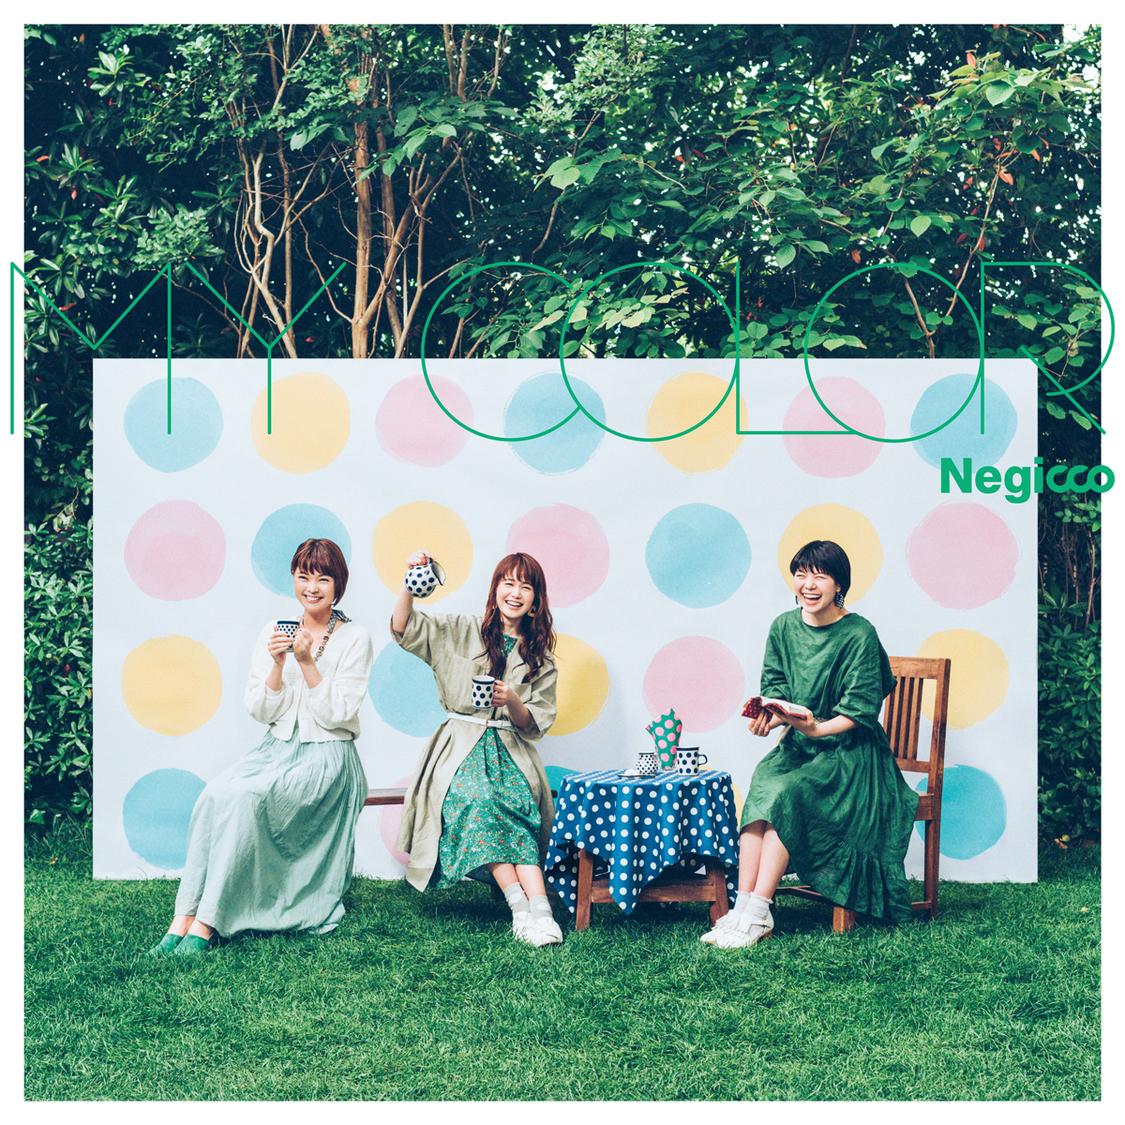 Negicco、『MY COLOR』アナログ盤リリース決定!